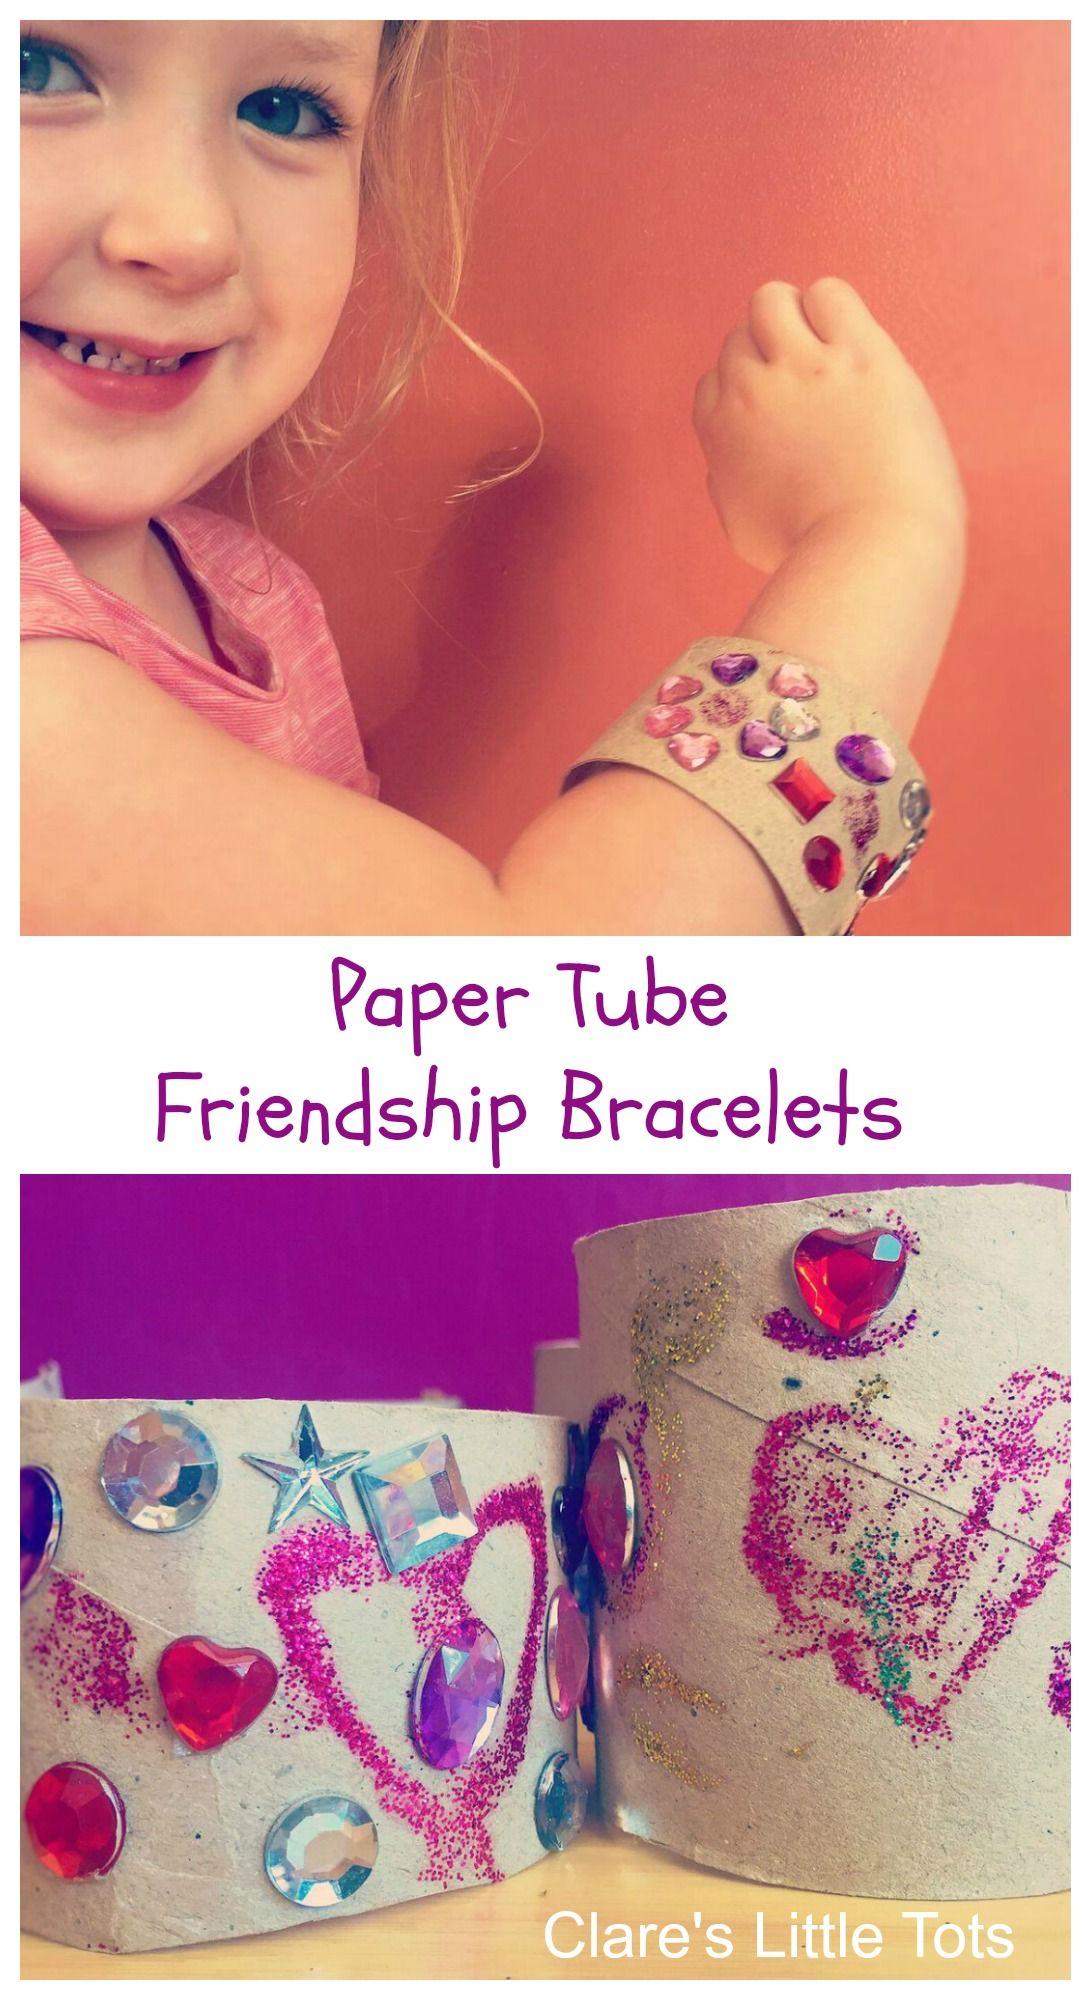 Paper Tube Friendship Bracelets